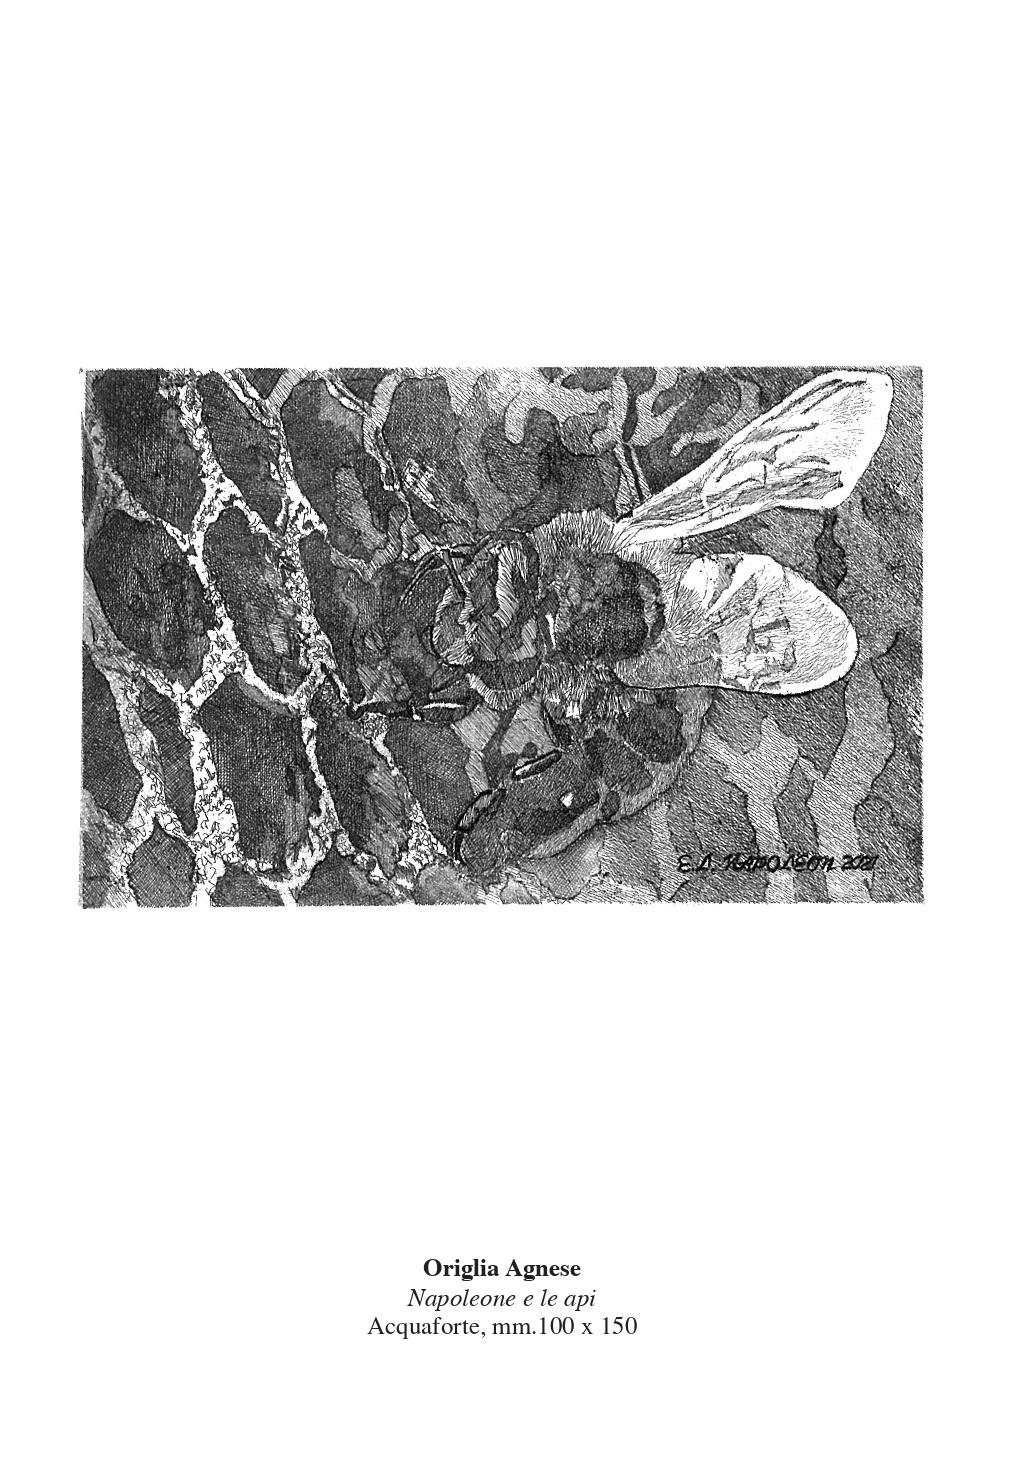 CATALOGO exlibris 2021-113_page-0001